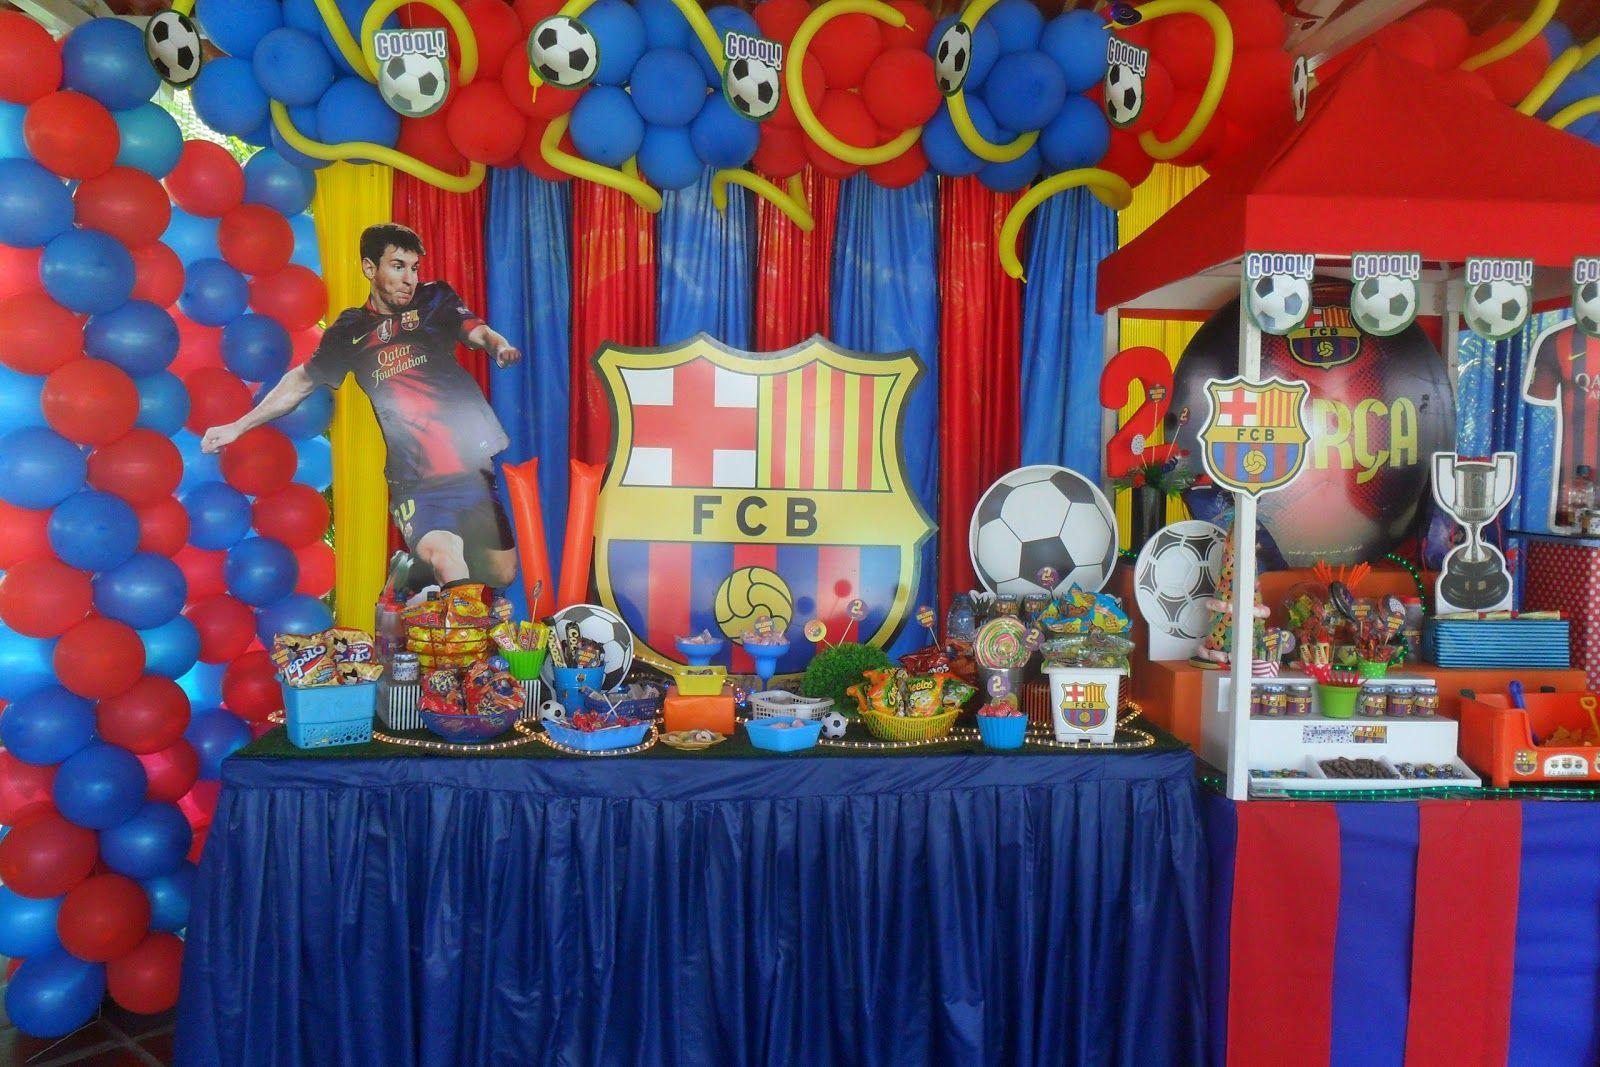 Arreglo de mesa para fiesta familiar buscar con google - Lucio barcelona decoracion ...